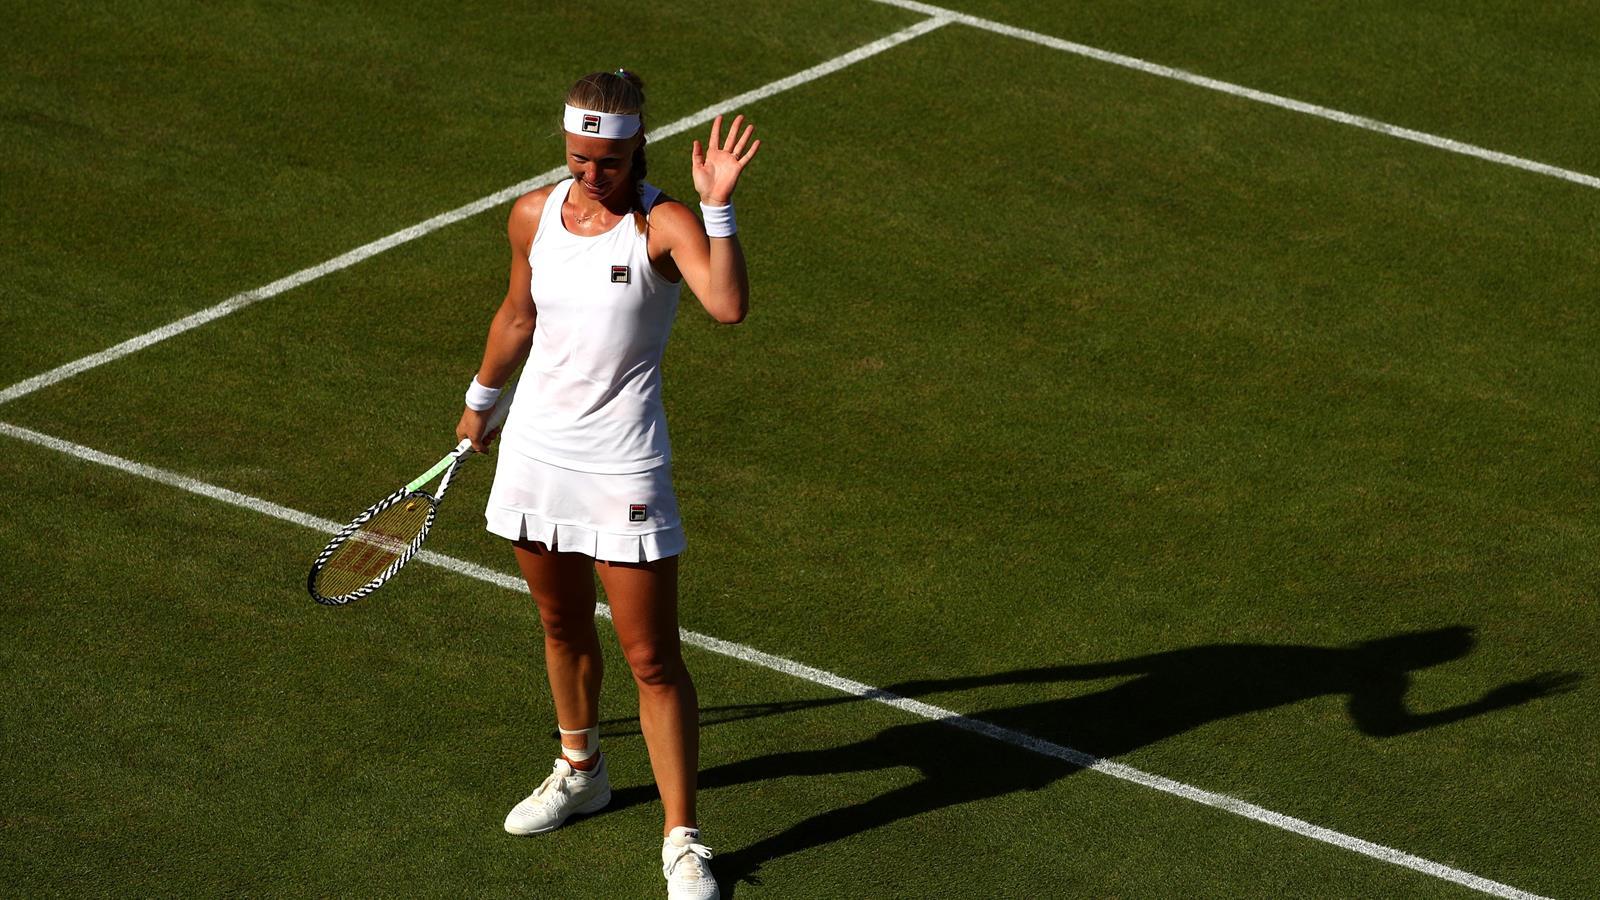 Samenvatting Kiki Bertens - Taylor Townsend (Wimbledon)